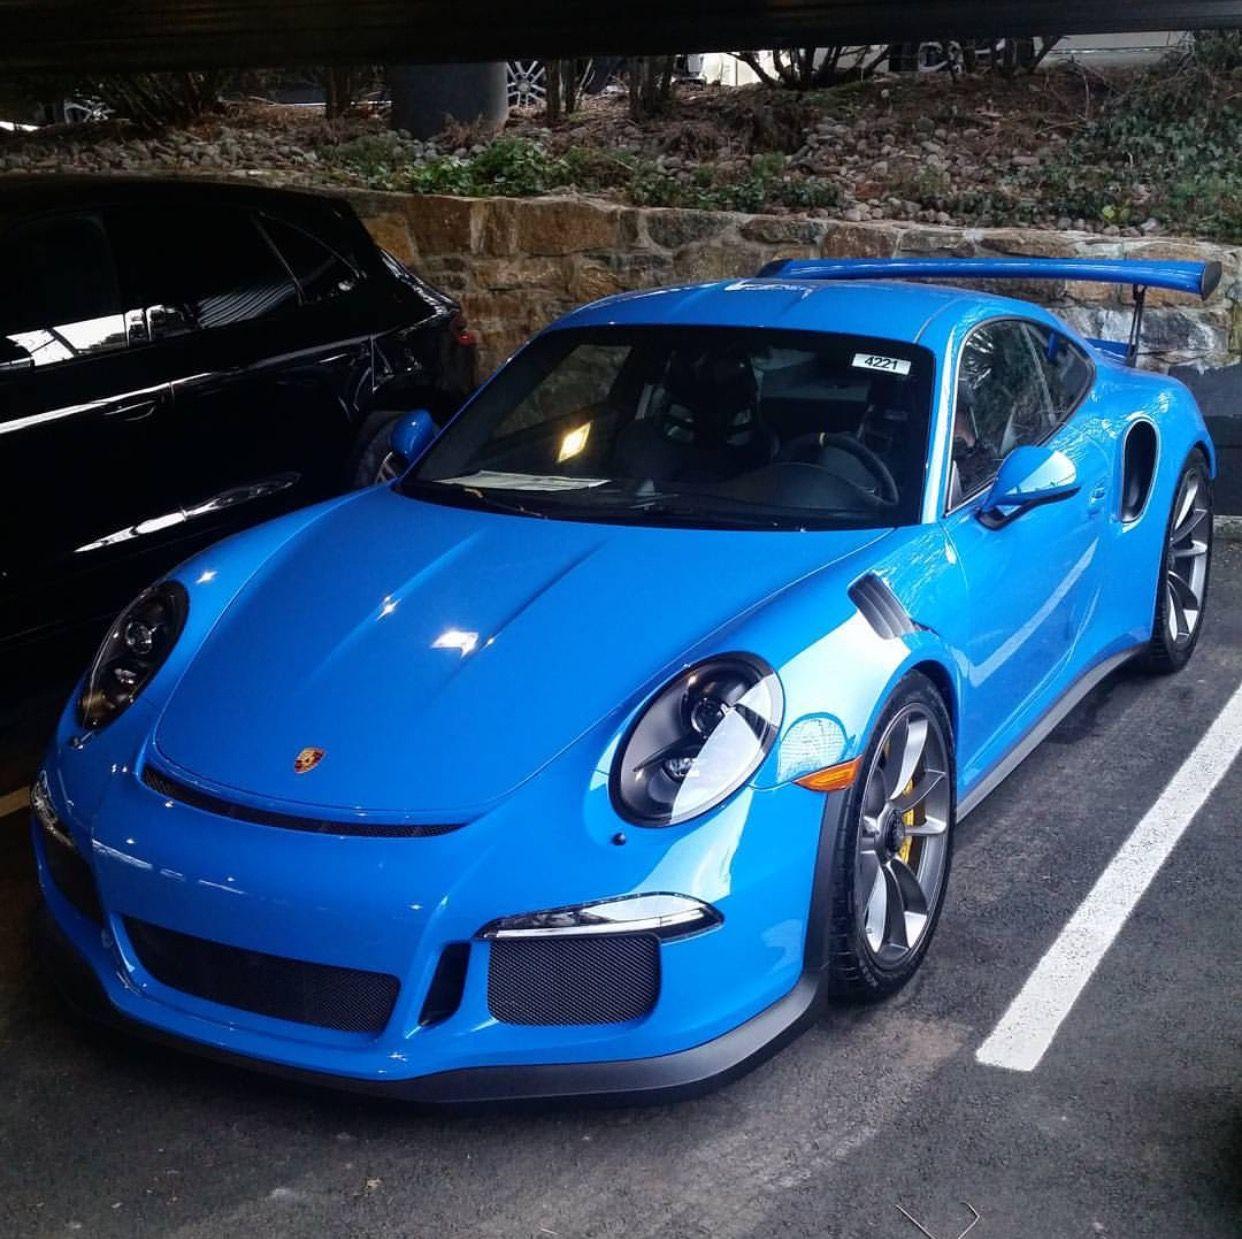 Porsche 911 Turbo Gt3: Porsche 991 GT3 RS Painted In Paint To Sample Voodoo Blue